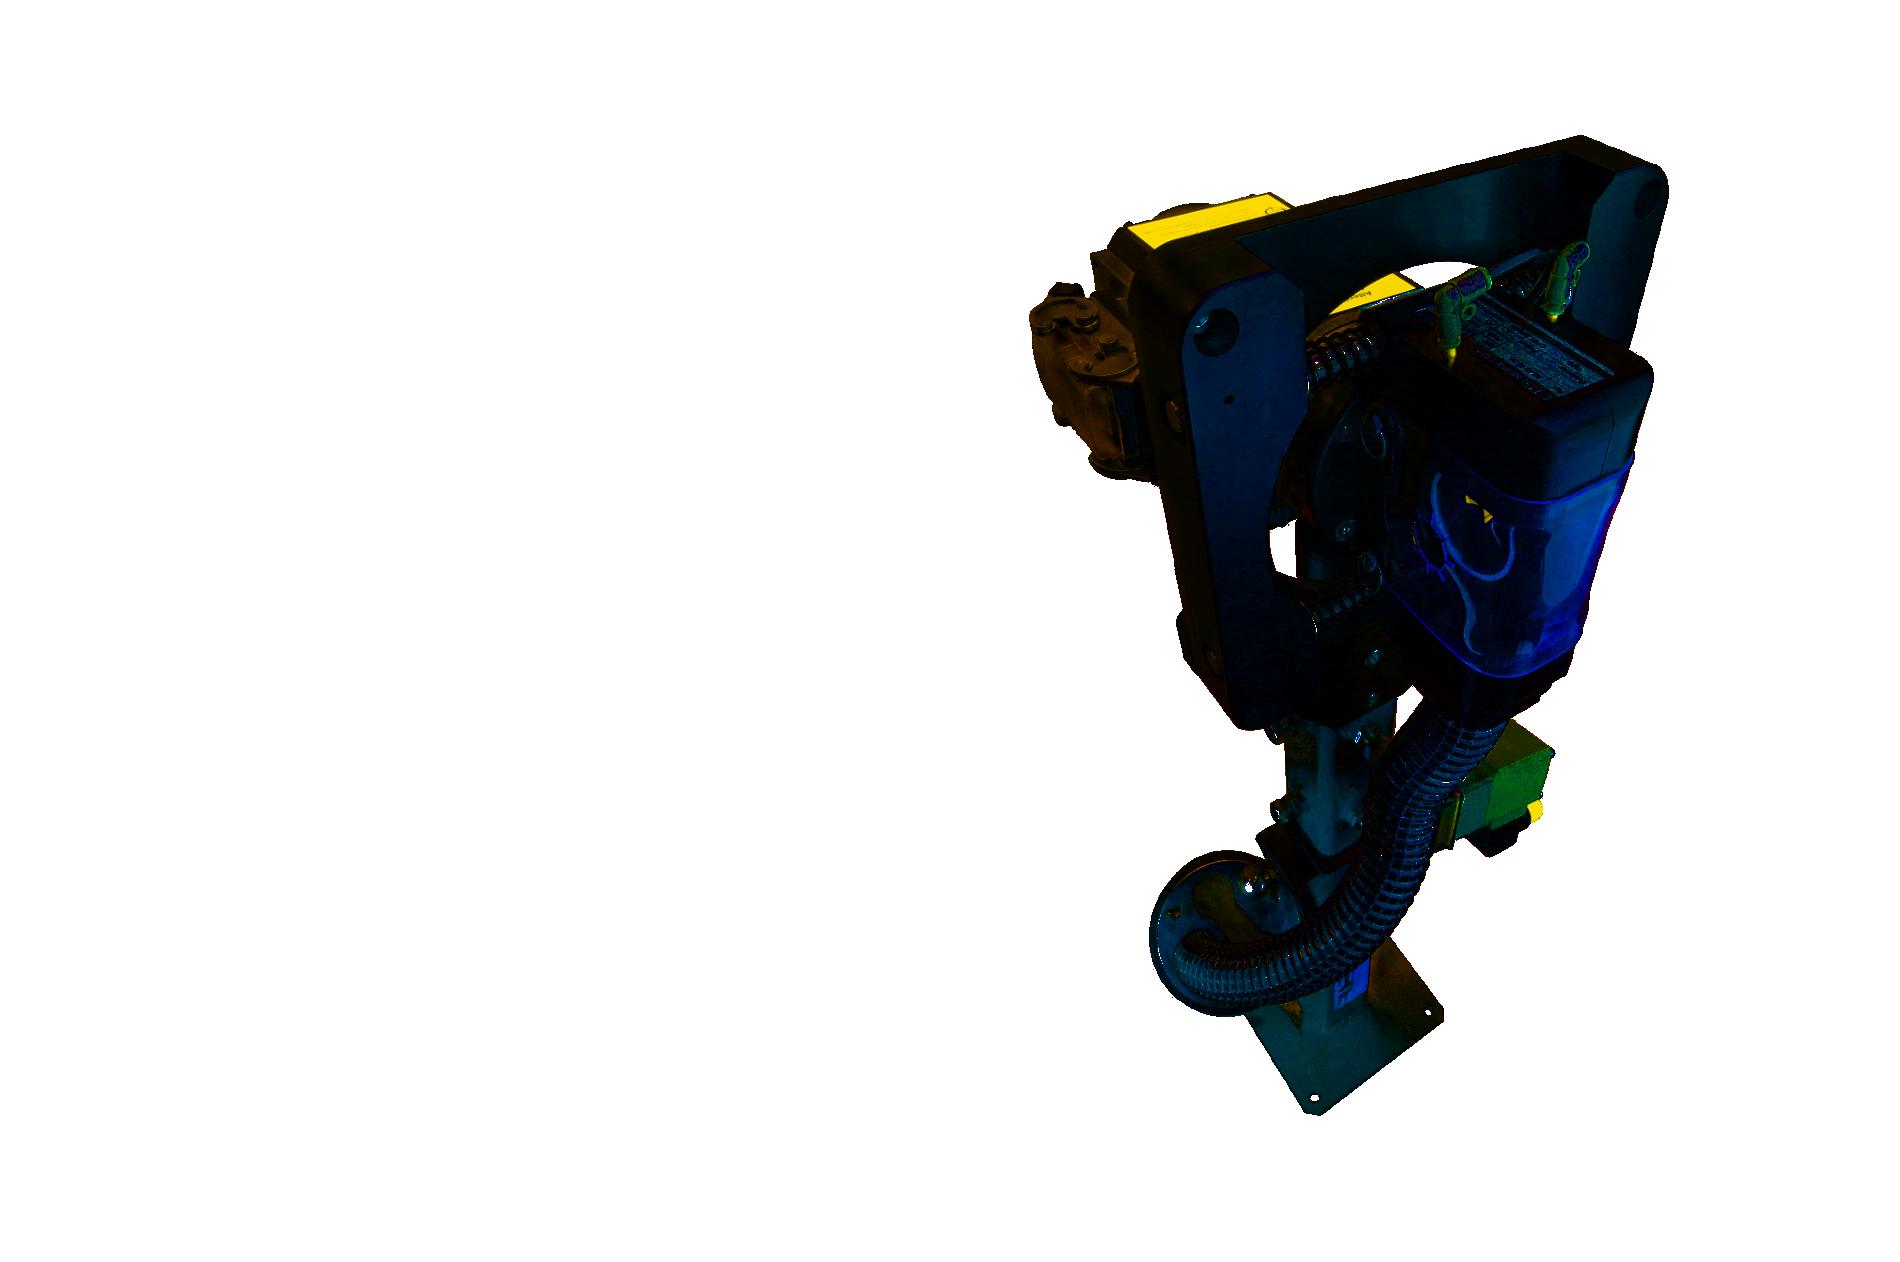 ETS Kappenfräser Slide 01